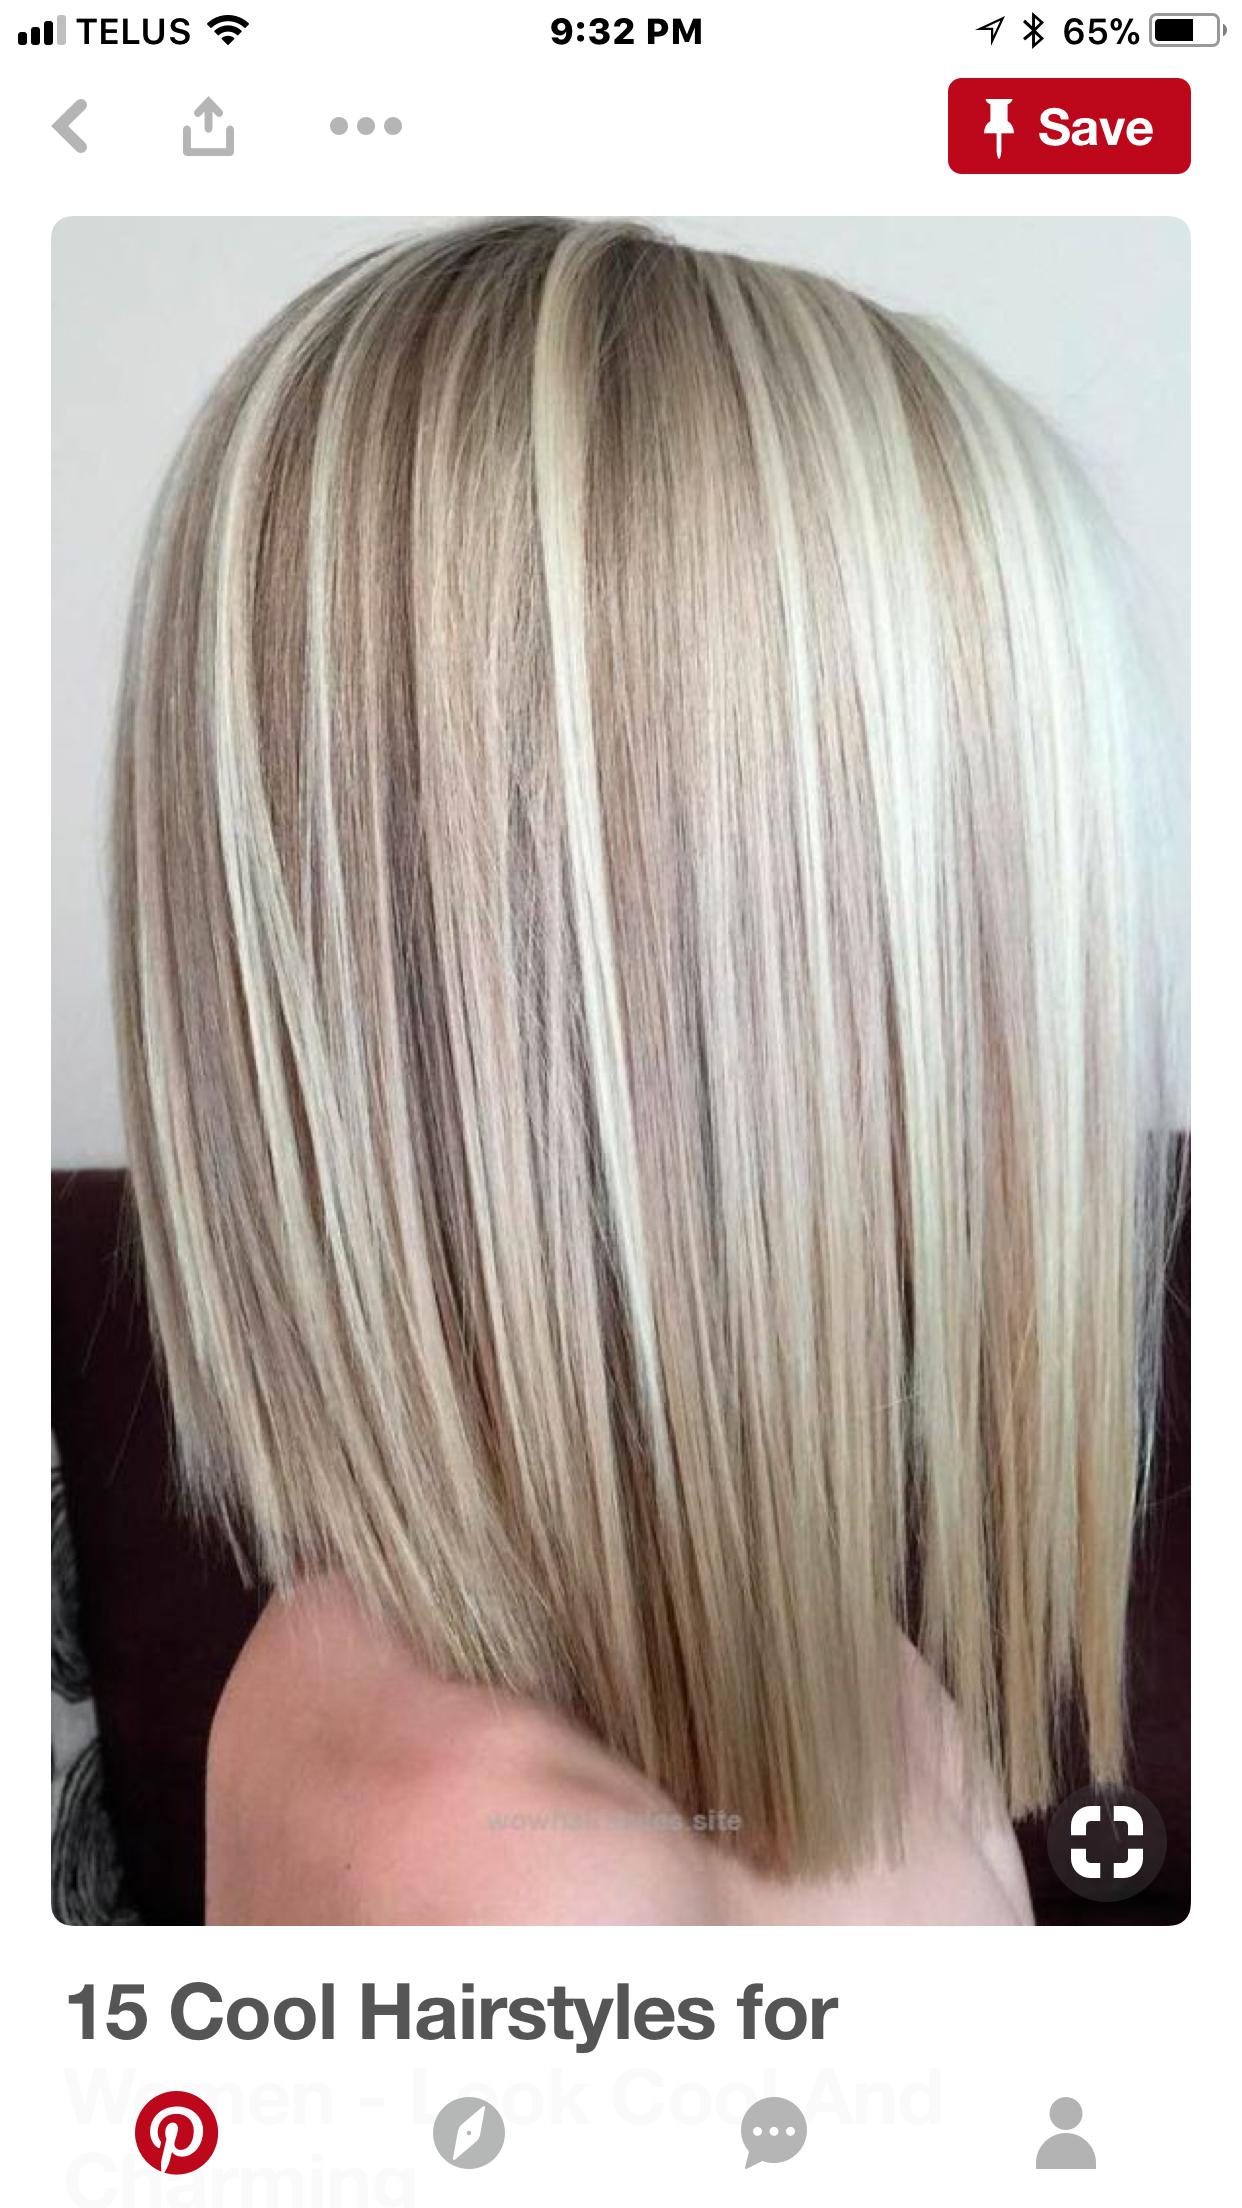 Pin by christine on hair cuts pinterest hair cuts hair style